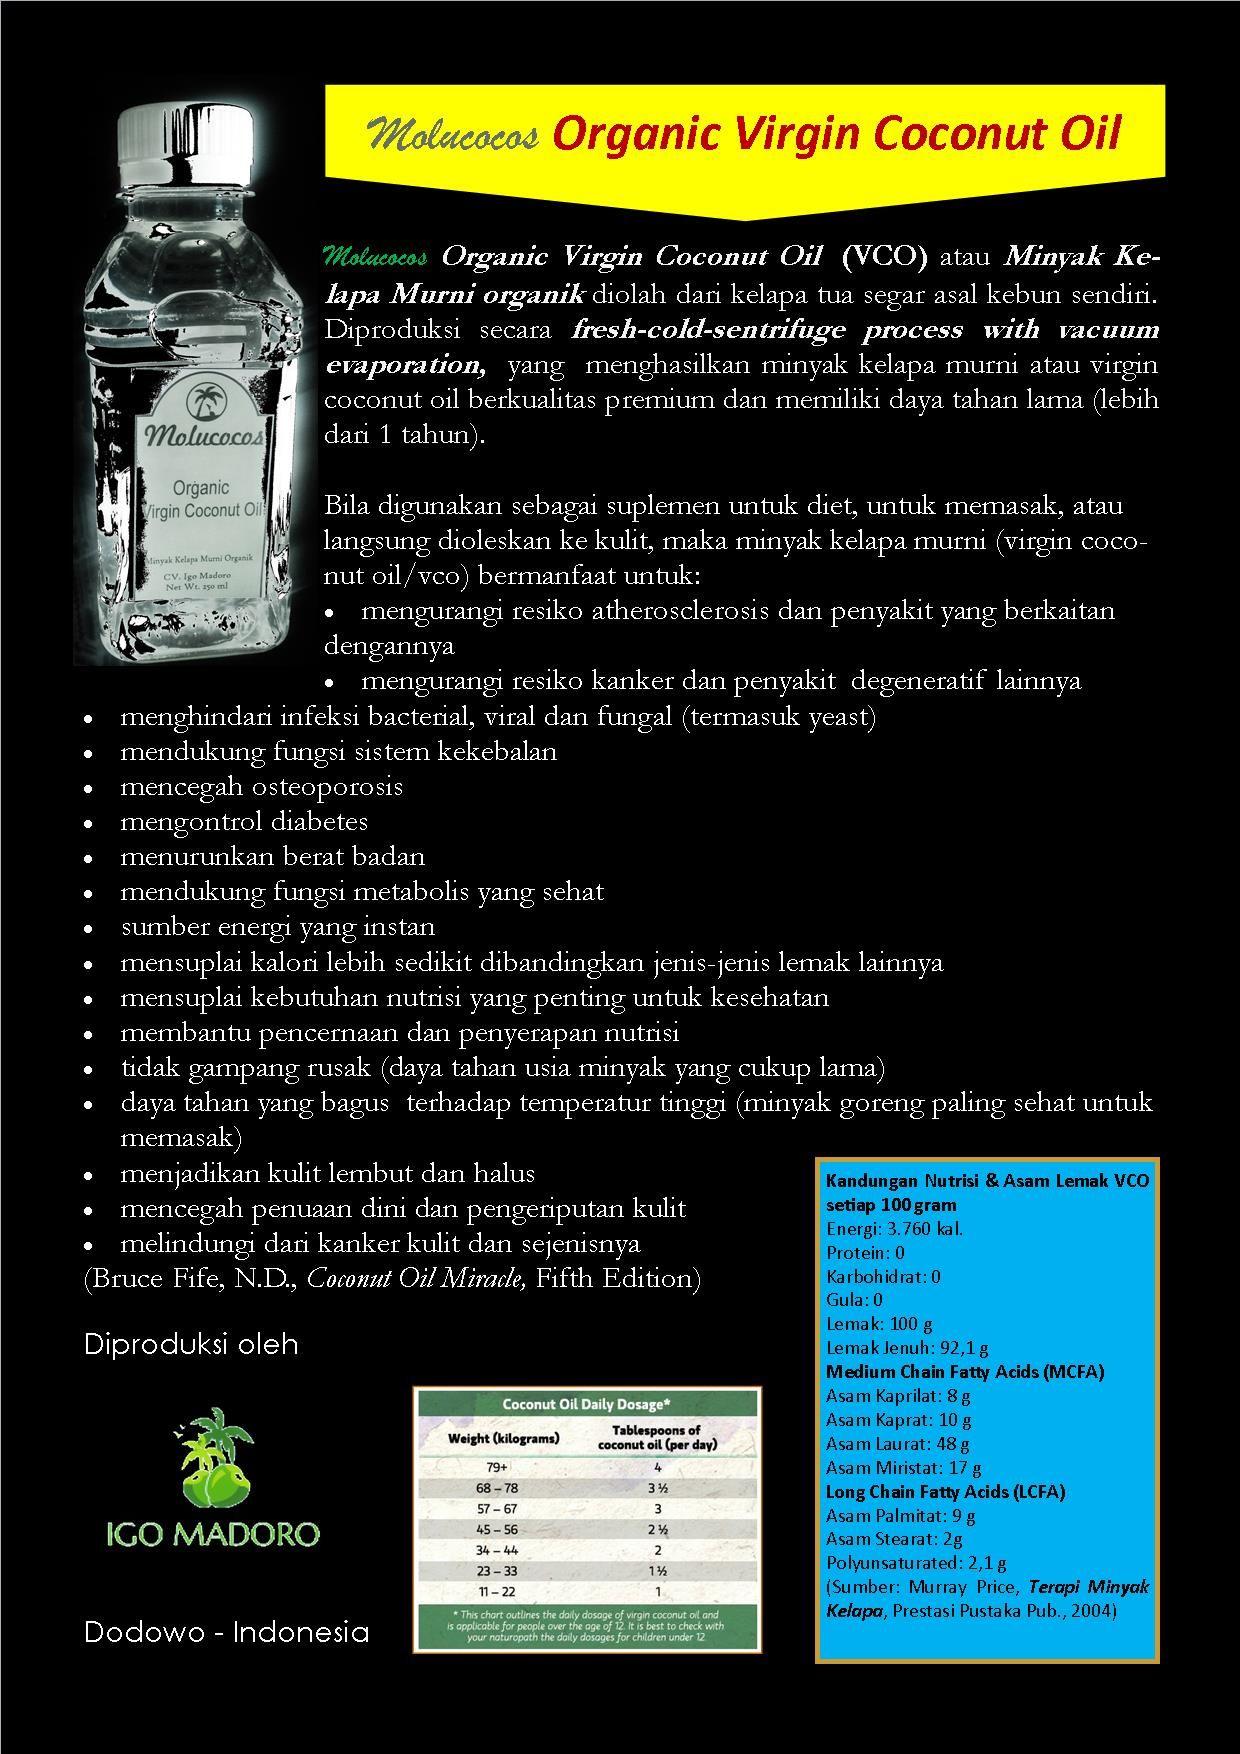 House Of Organix Extra Virgin Coconut Oil 1 Litre Minyak Kelapa Vico Bagoes Vco 1l Liter